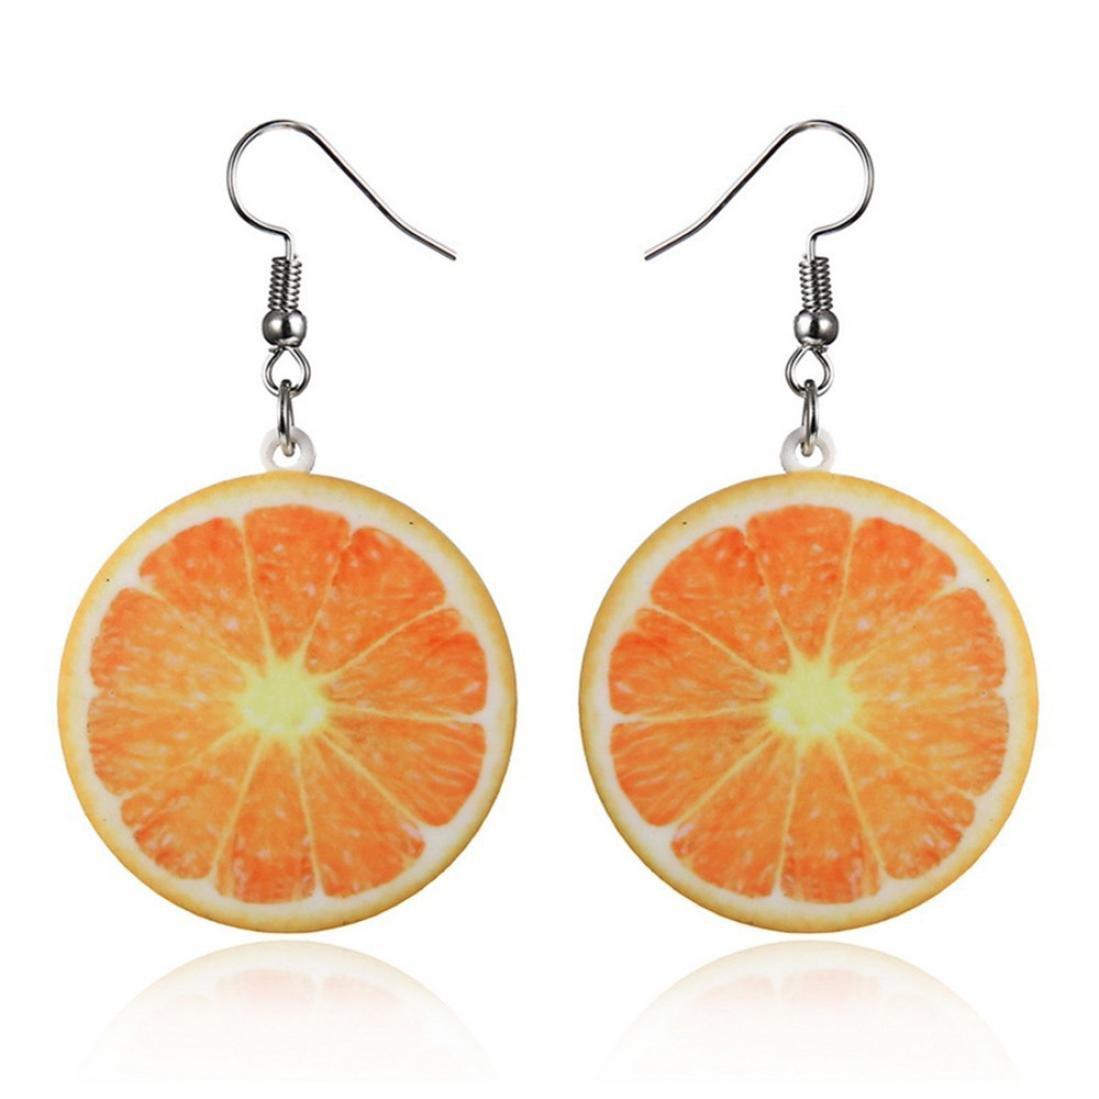 Trendy Statement Creative Funny Lifelike Fruits Acrylic Earrings for Women/Girl's (F)